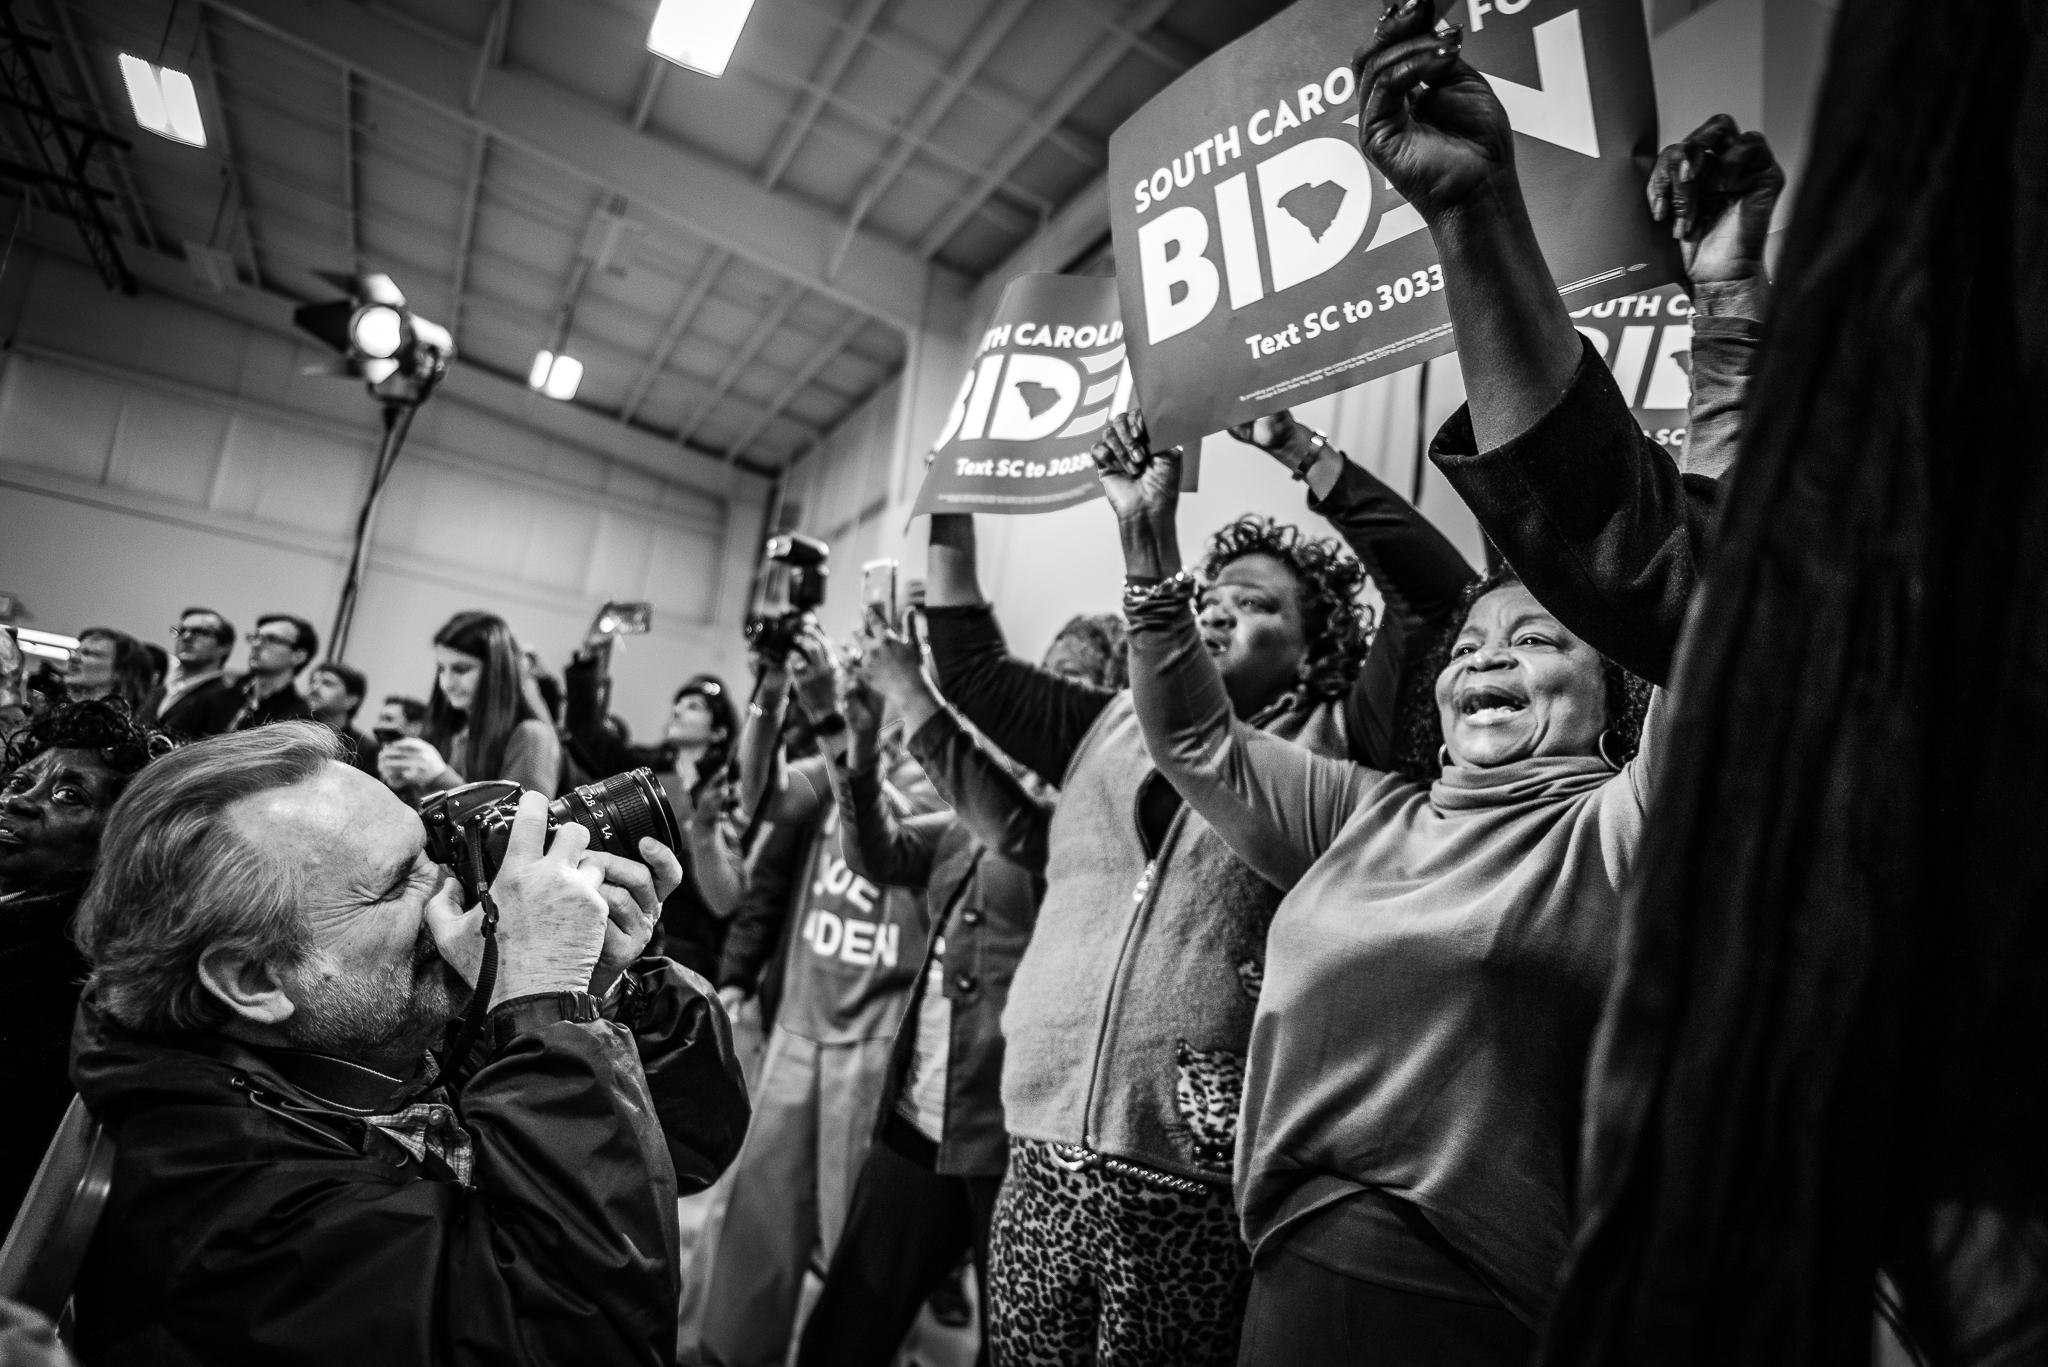 A photographer snaps a photo of a cheering crowd, raising signs at a Joe Biden rally in Sumter, South Carolina. February 28, 2020. Photo: Lance Monotone.